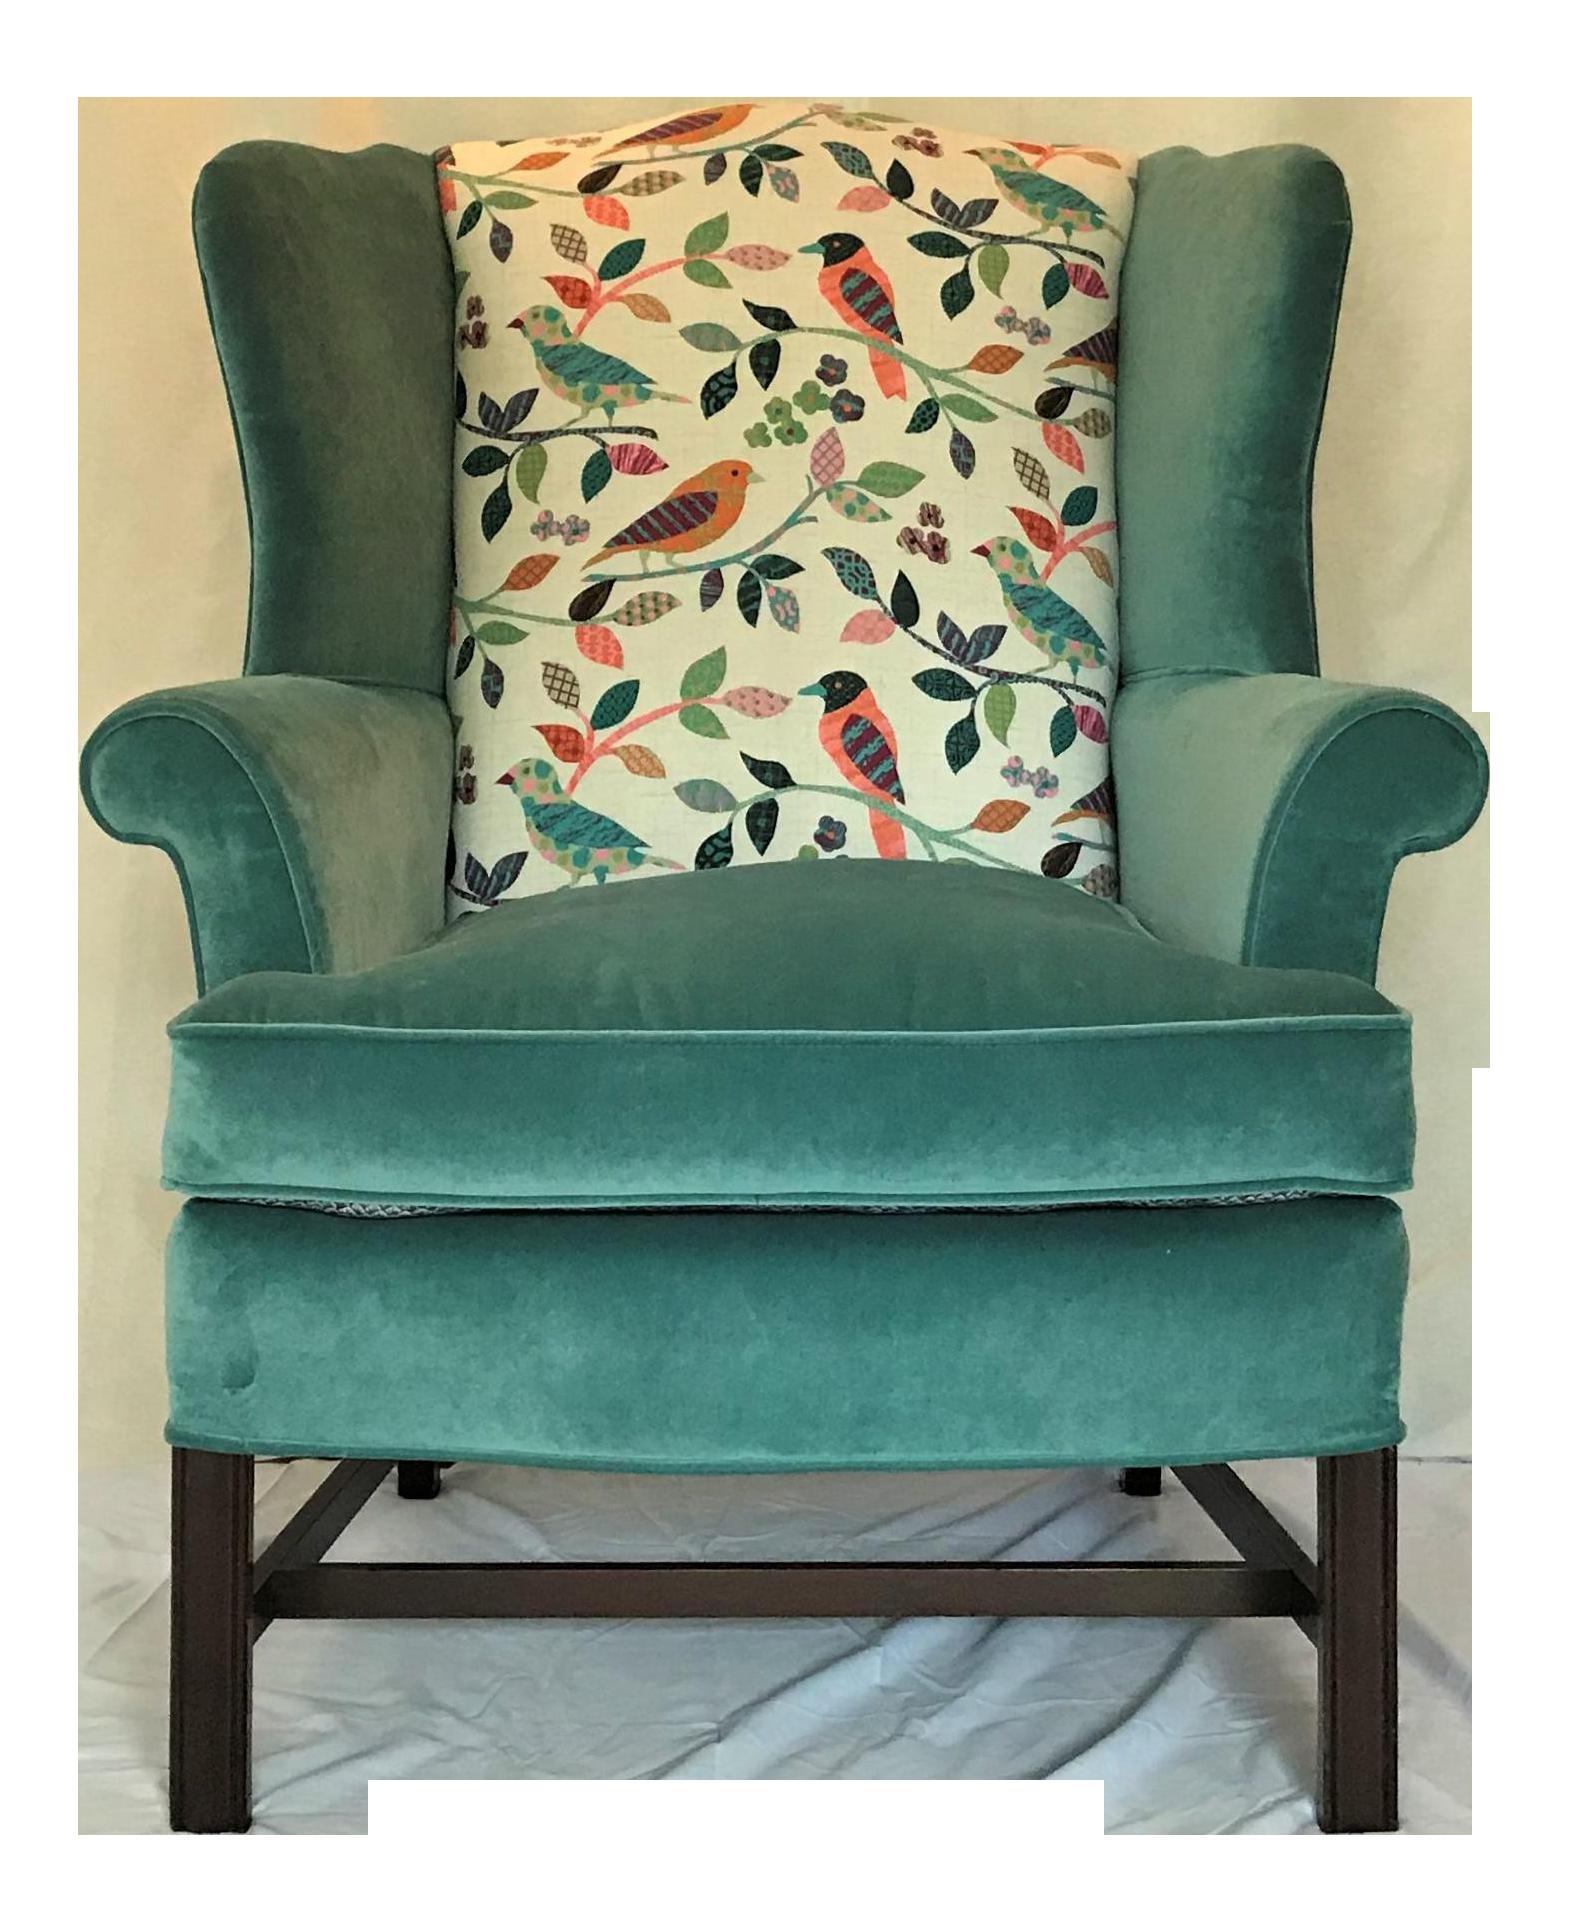 1940s Vintage Teal Velvet Chippendale Wingback Chair